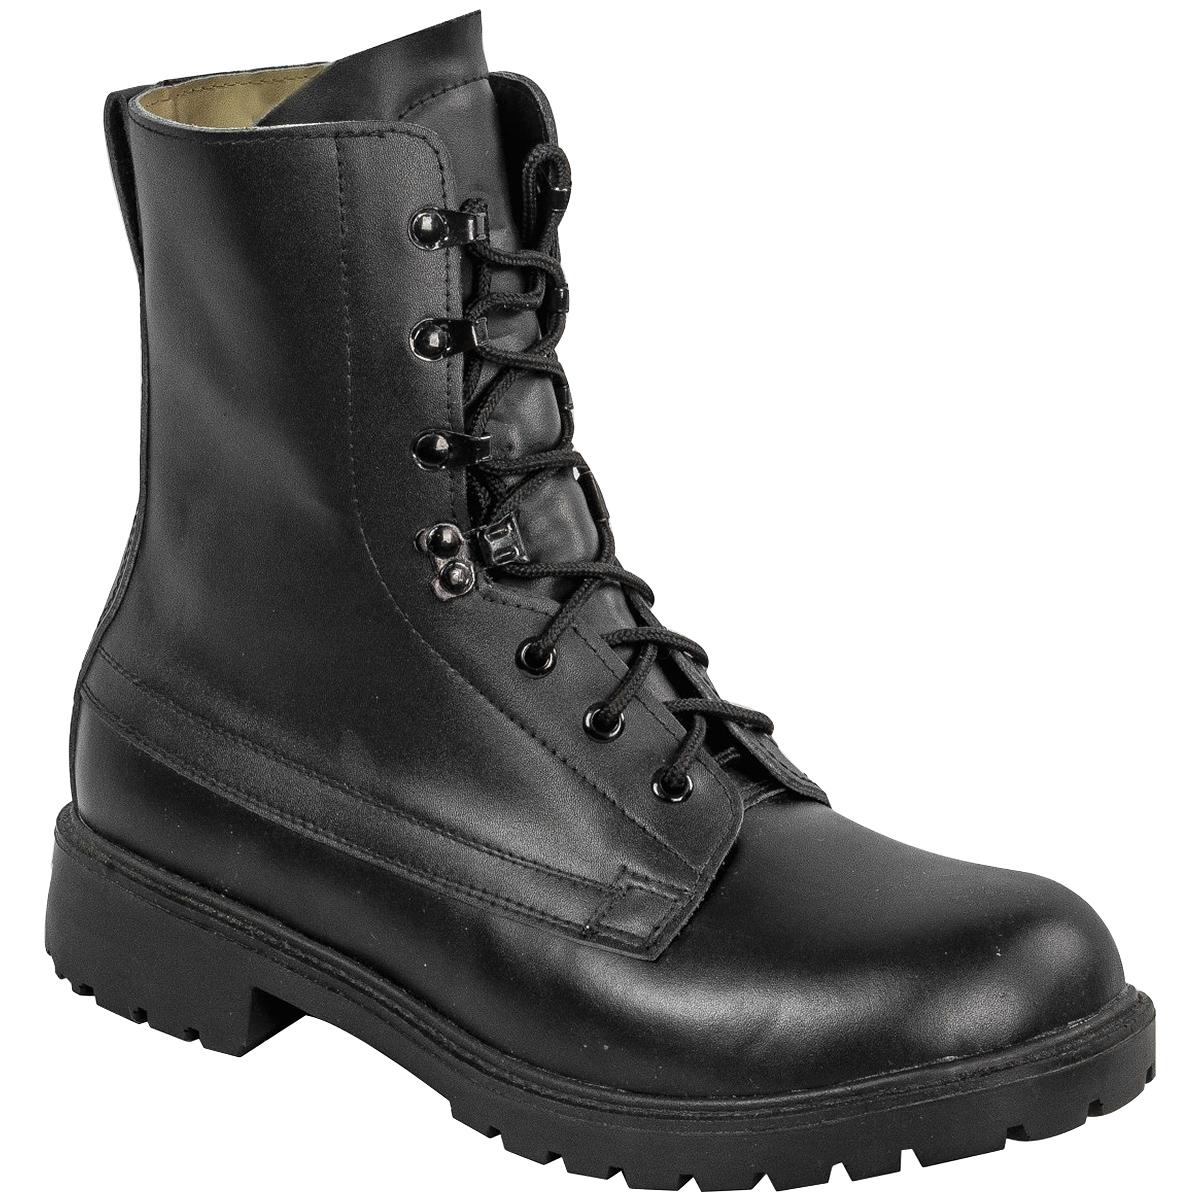 Highlander Ranger Assault Boots Black  NALETKJDI